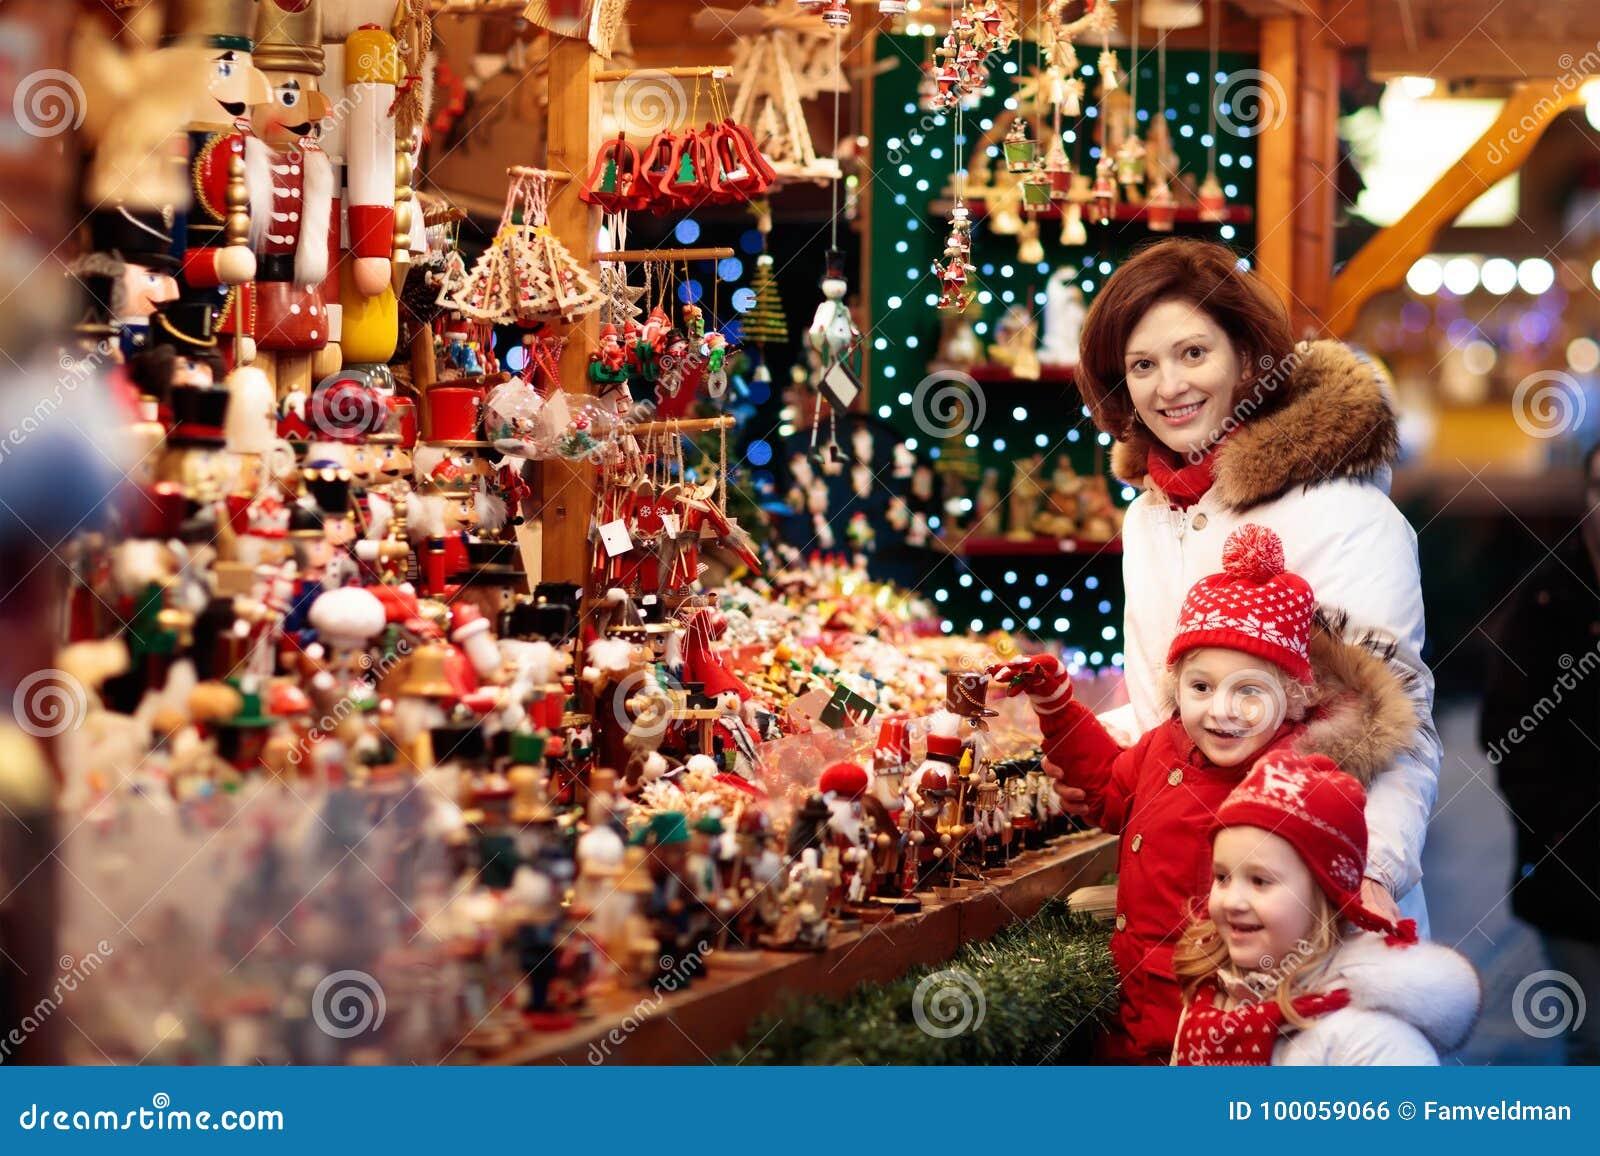 Family Shopping Christmas Presents Stock Photo - Image of handmade ...